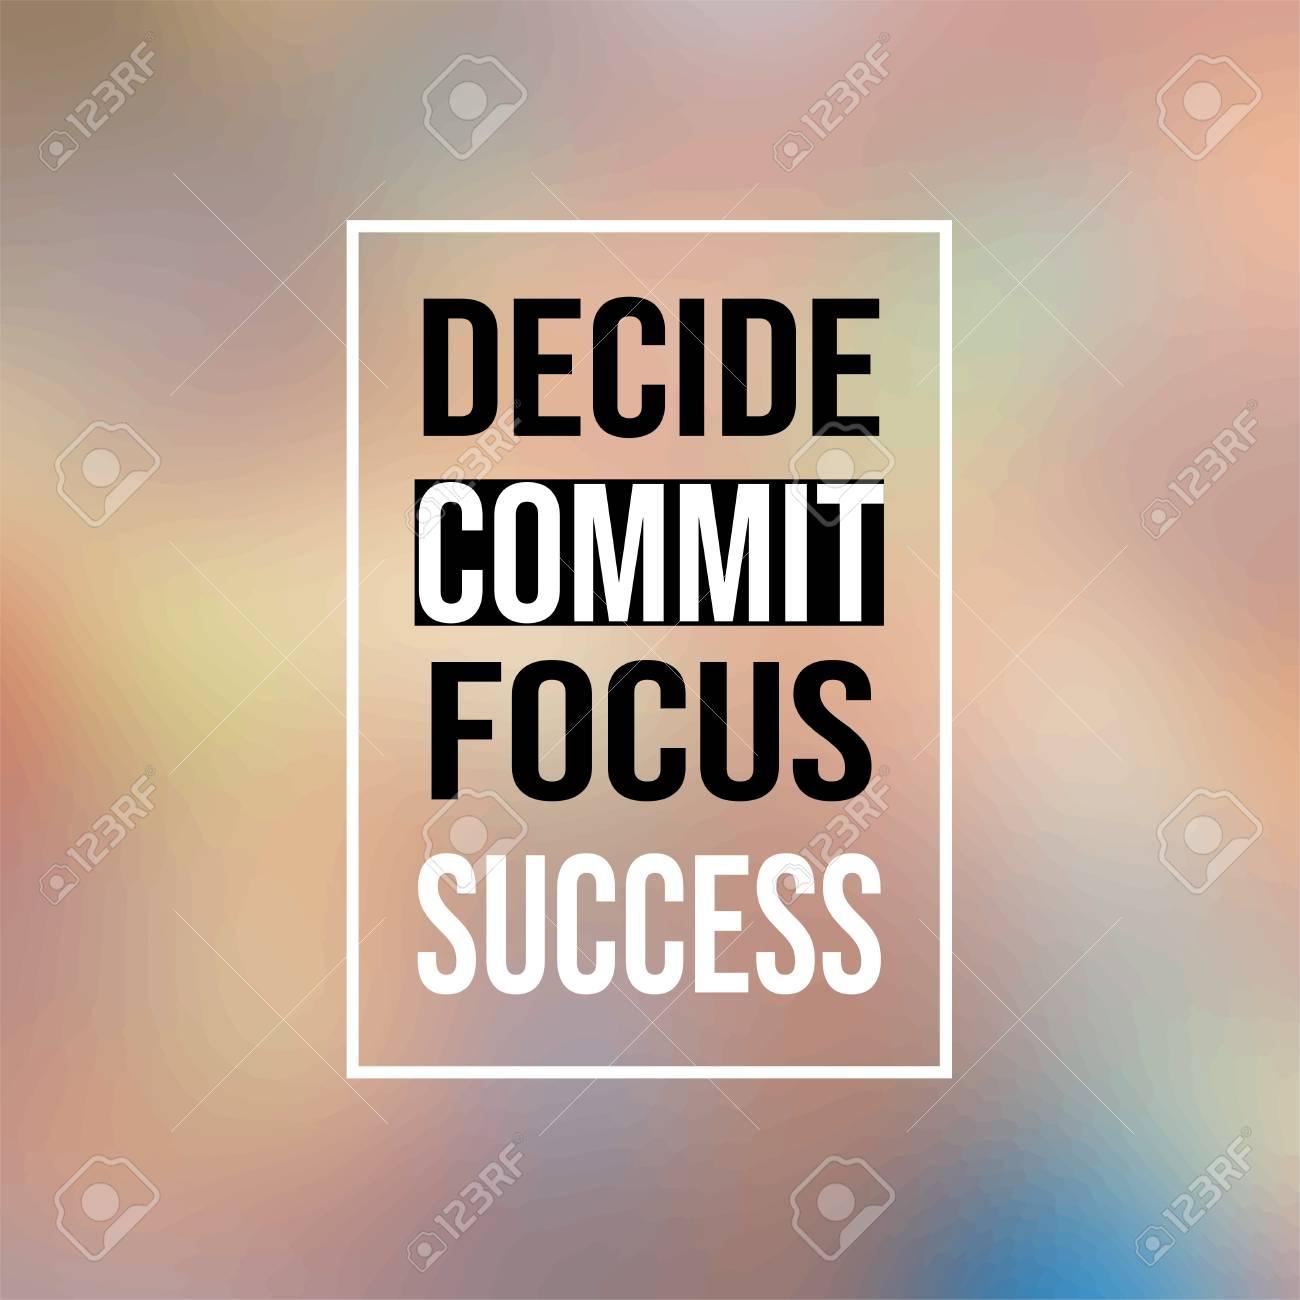 Decide Commit Focus Success Inspiration And Motivation Quote